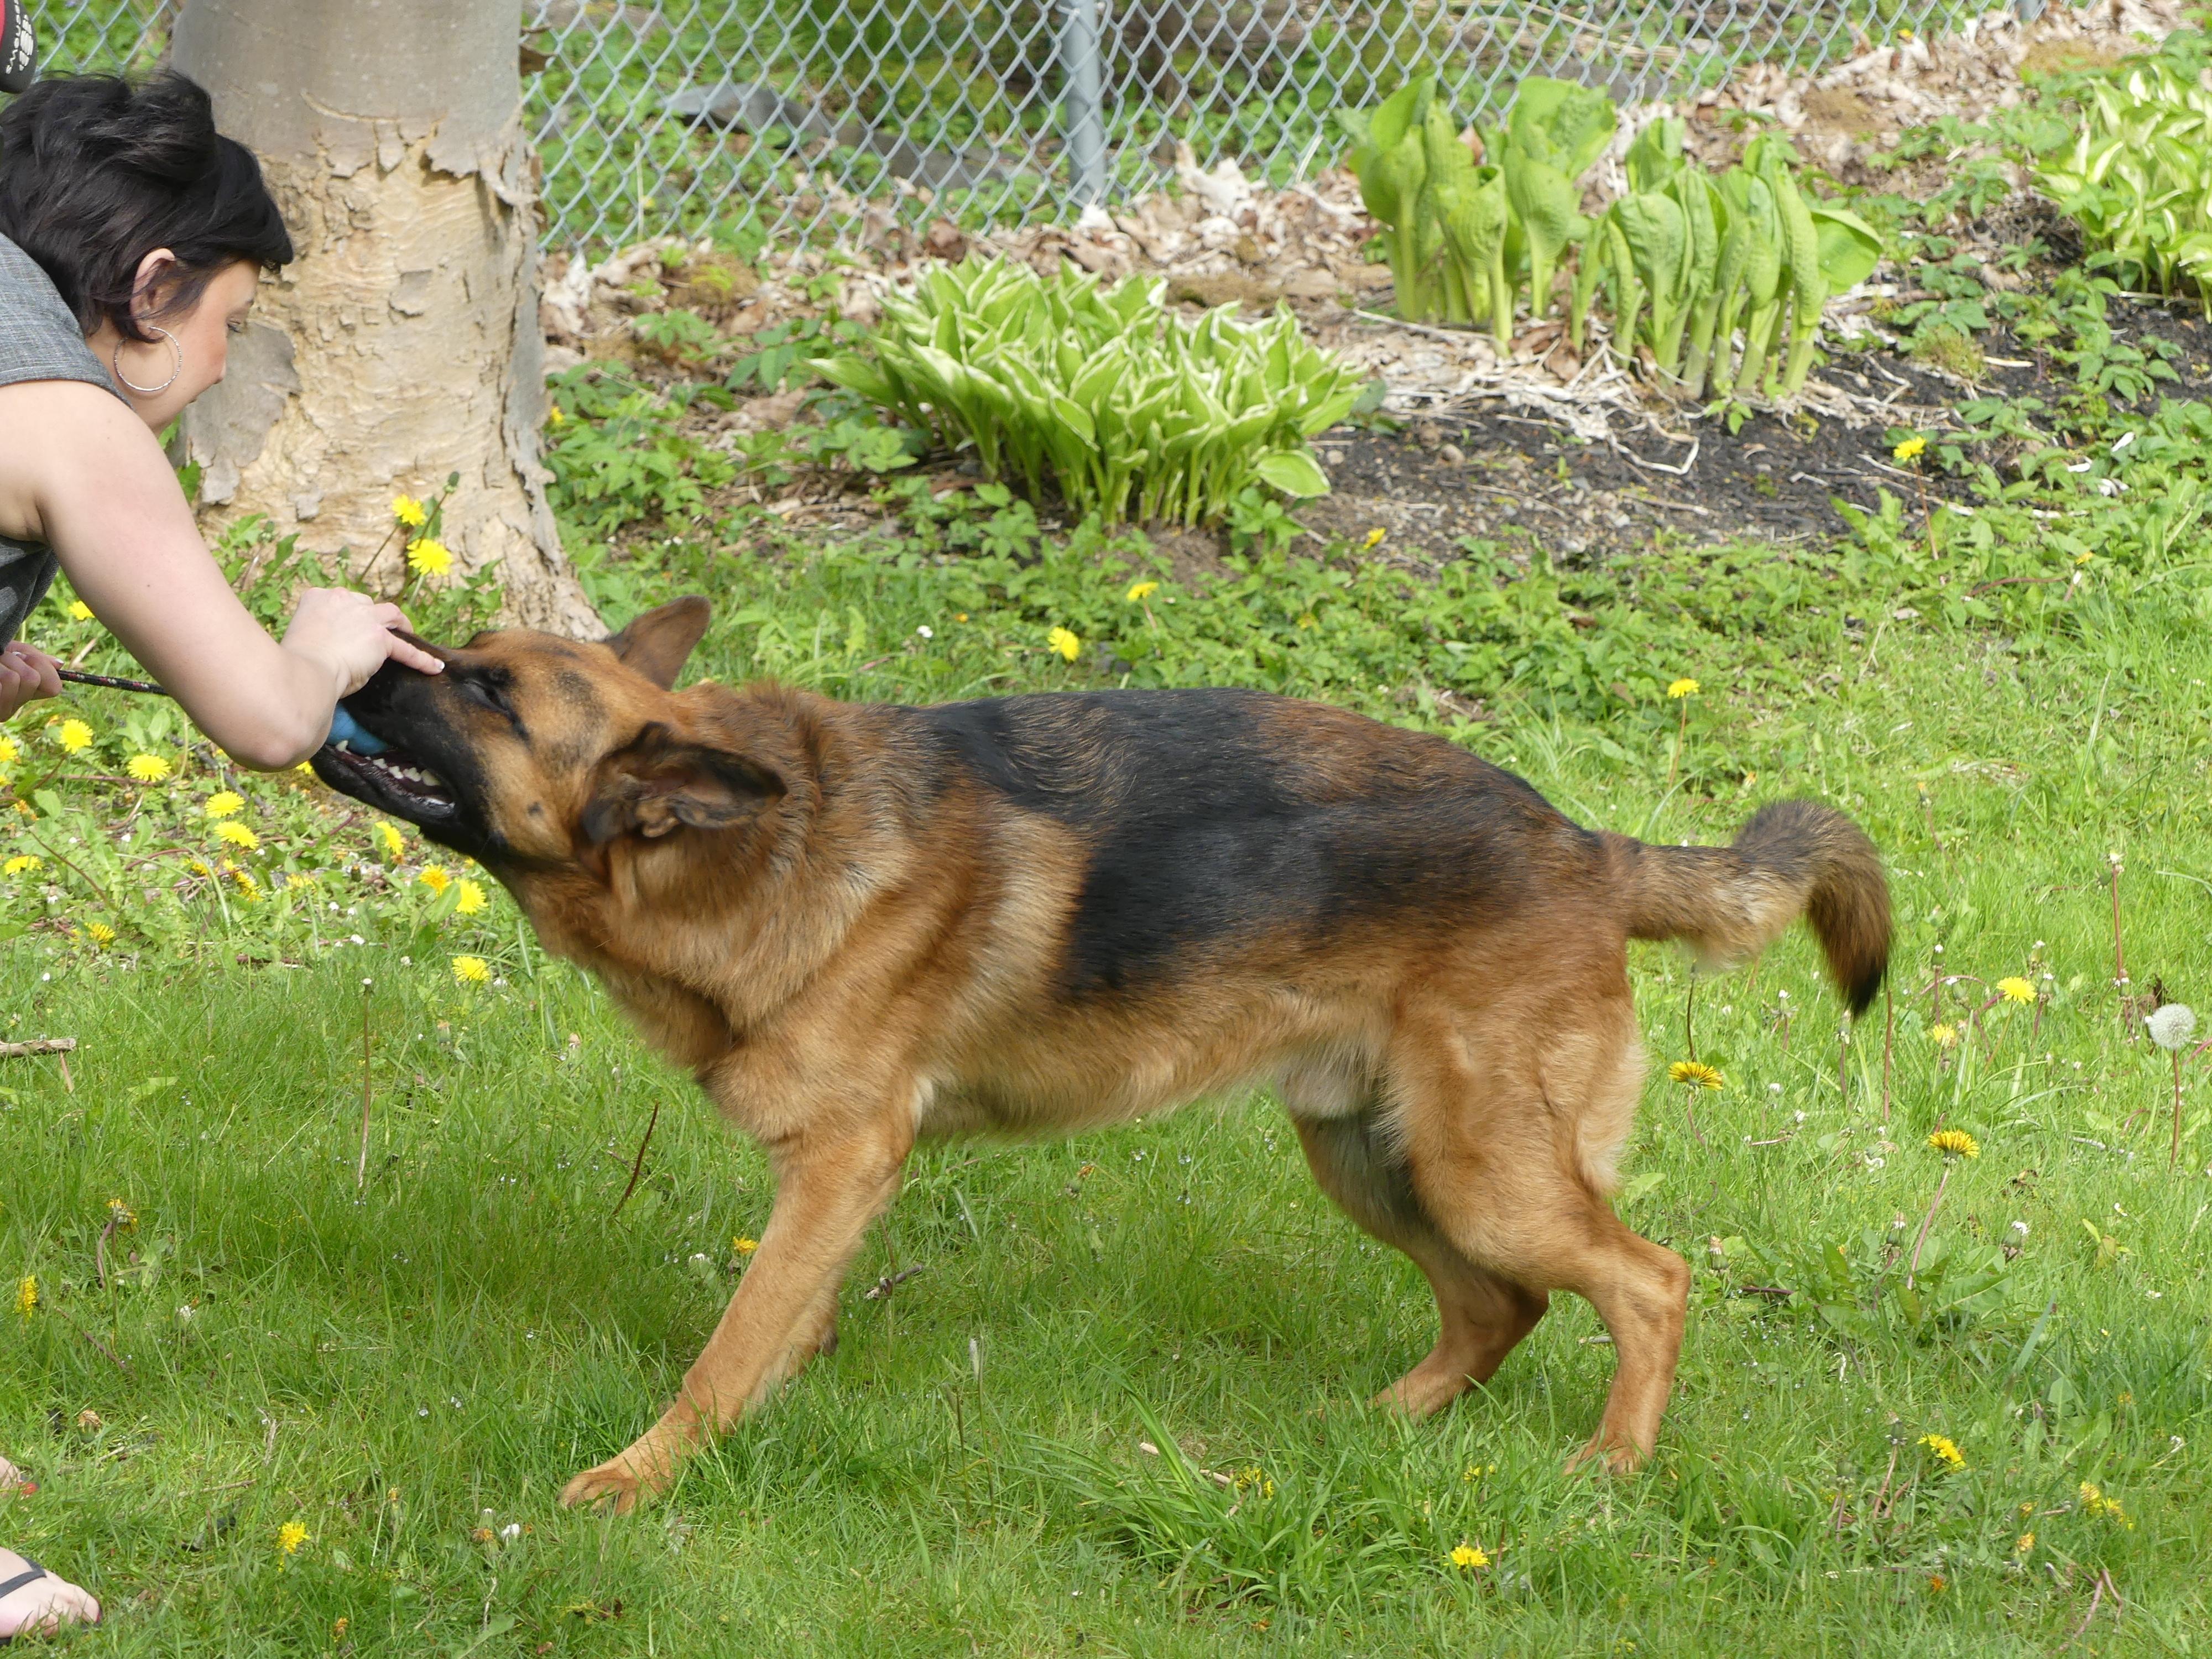 Gabe is Esther Vardy's beloved service dog. (Ariana Kelland/CBC)